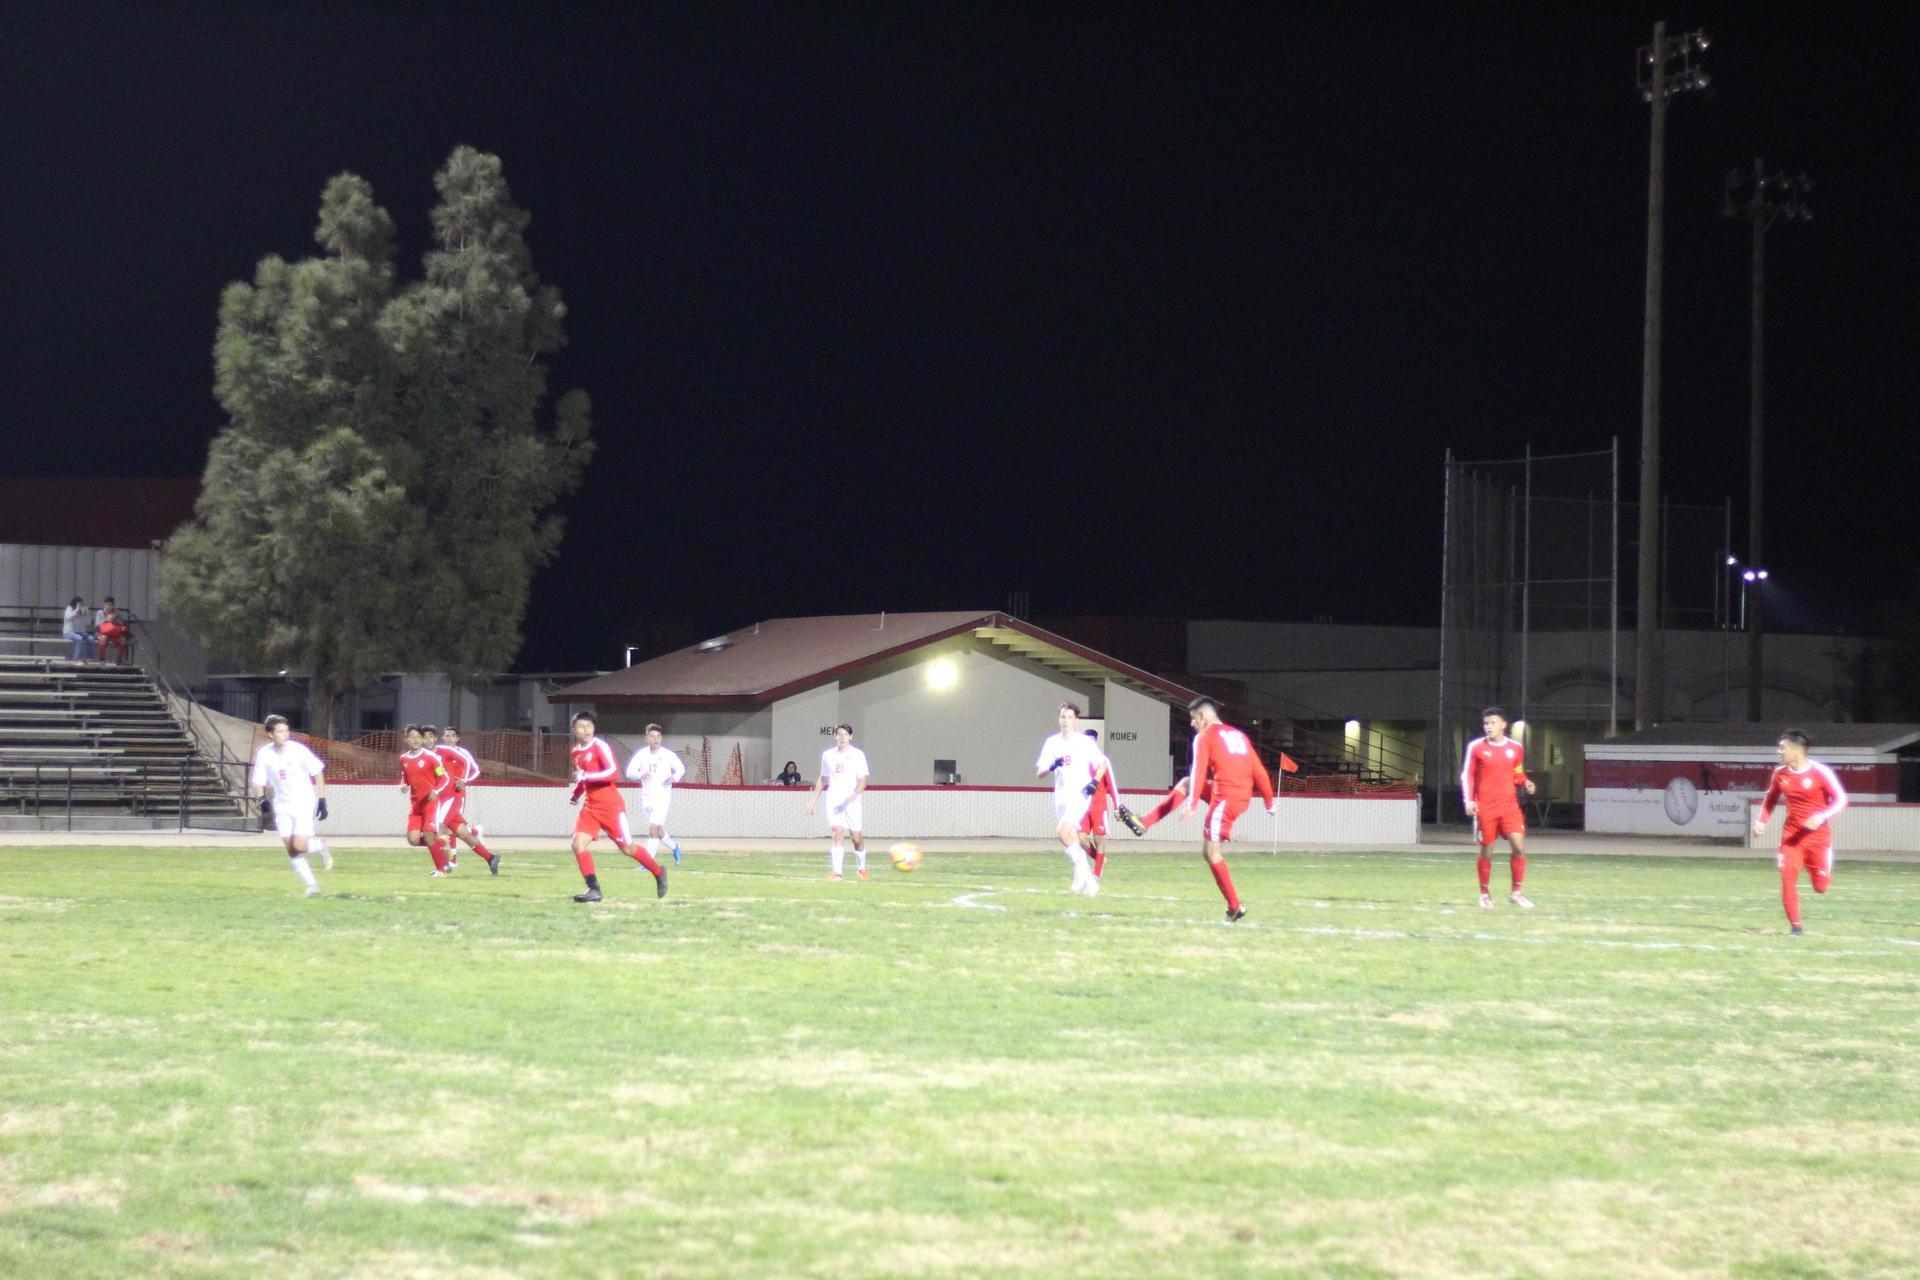 Christian Fernandez kicking the ball